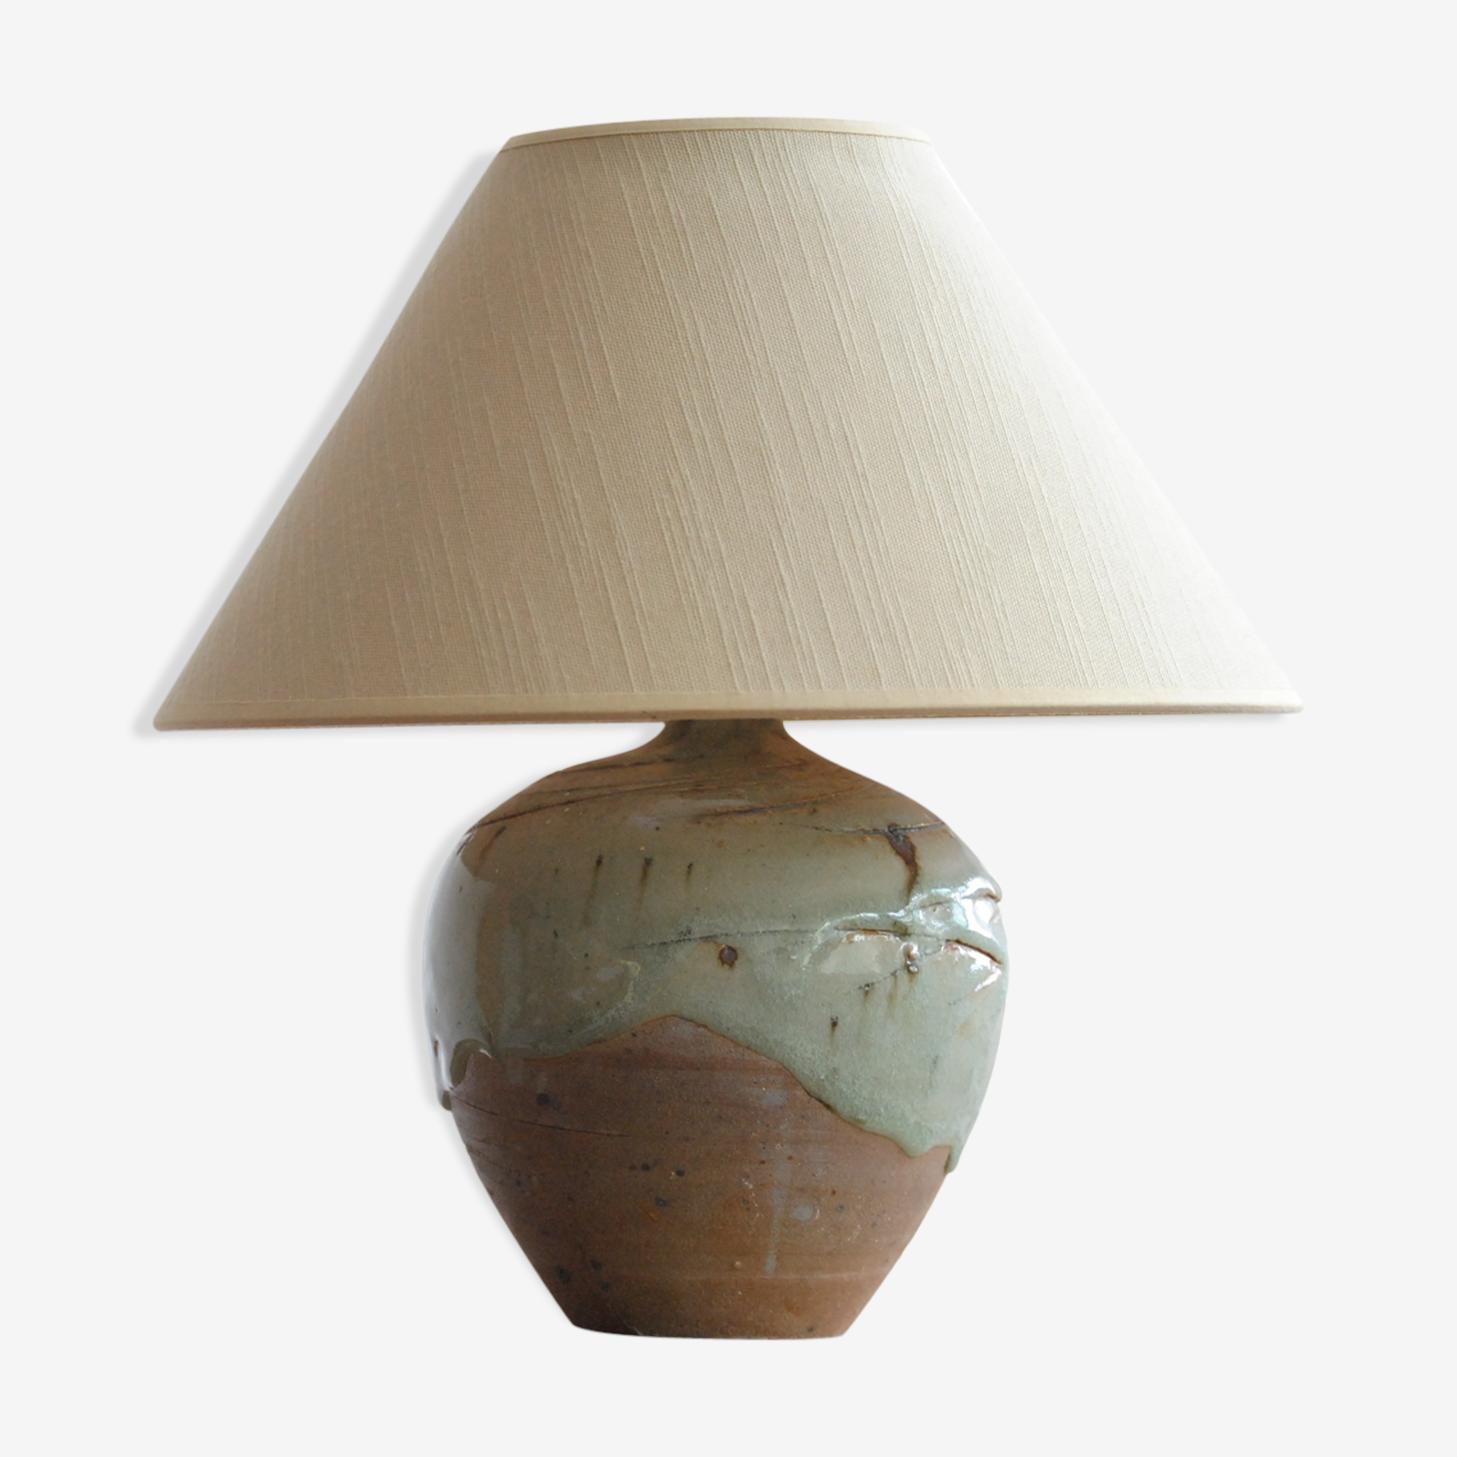 Pied de lampe en grès